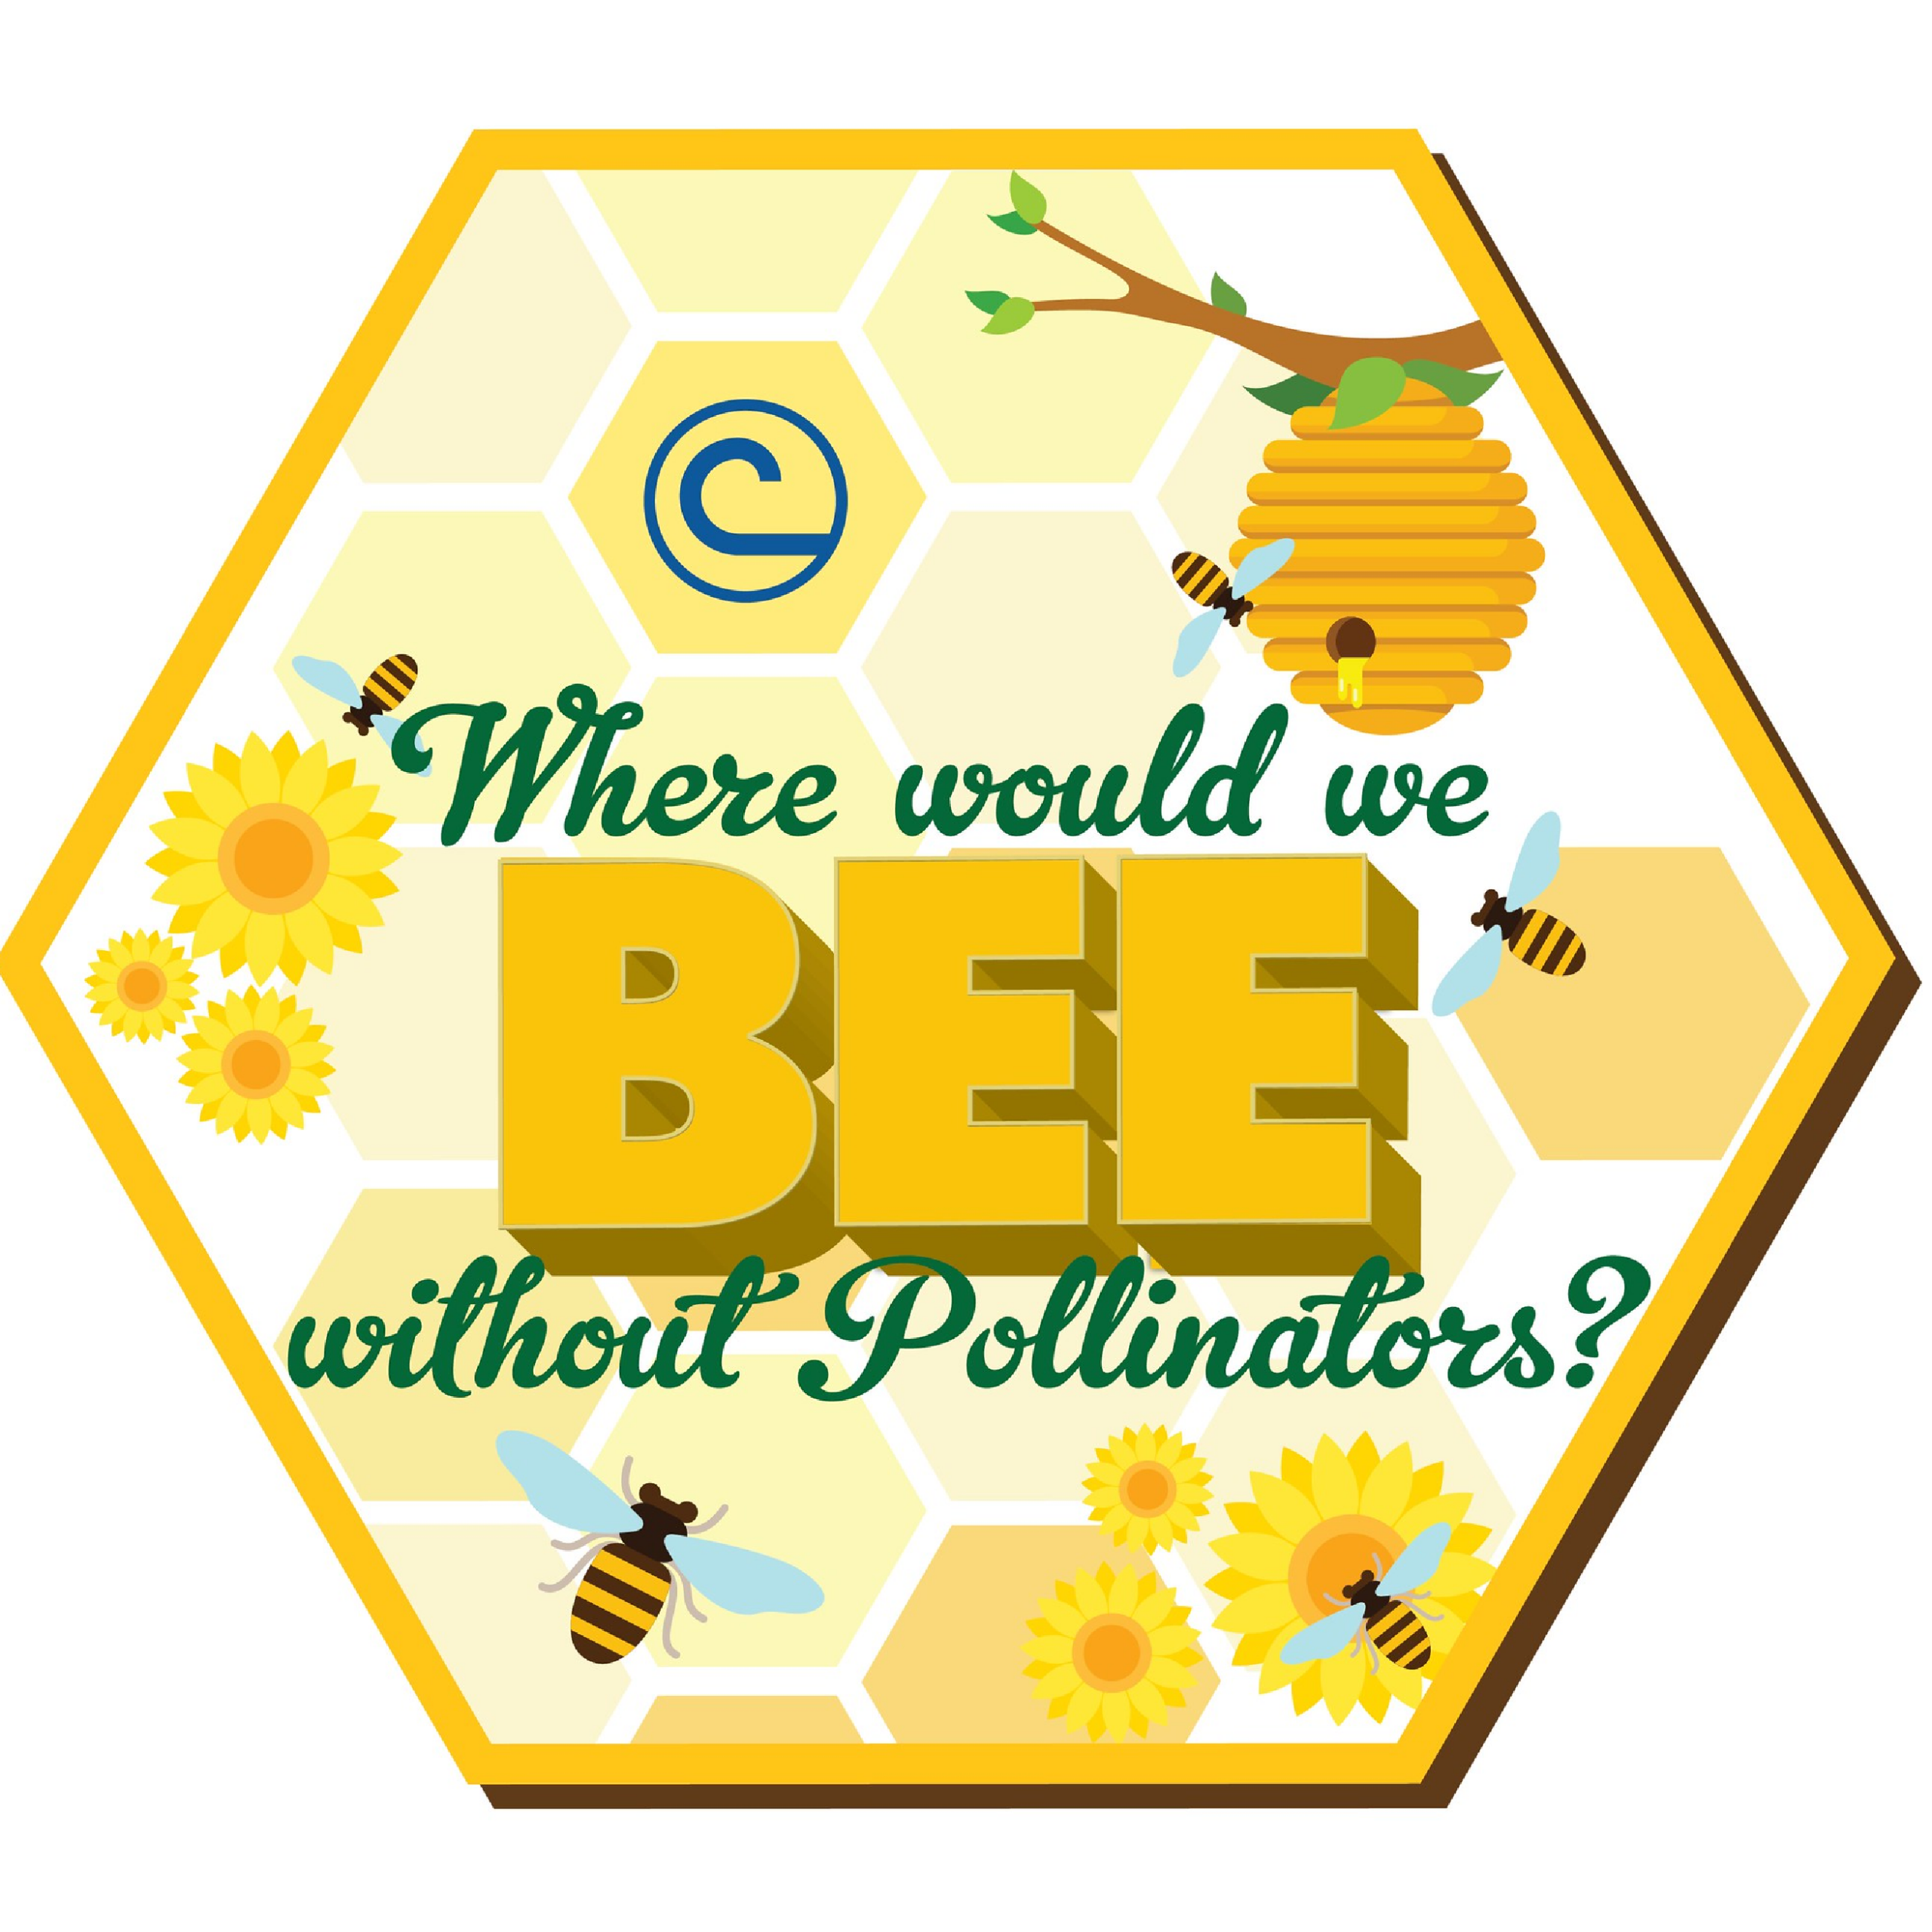 Bee a pollinator!